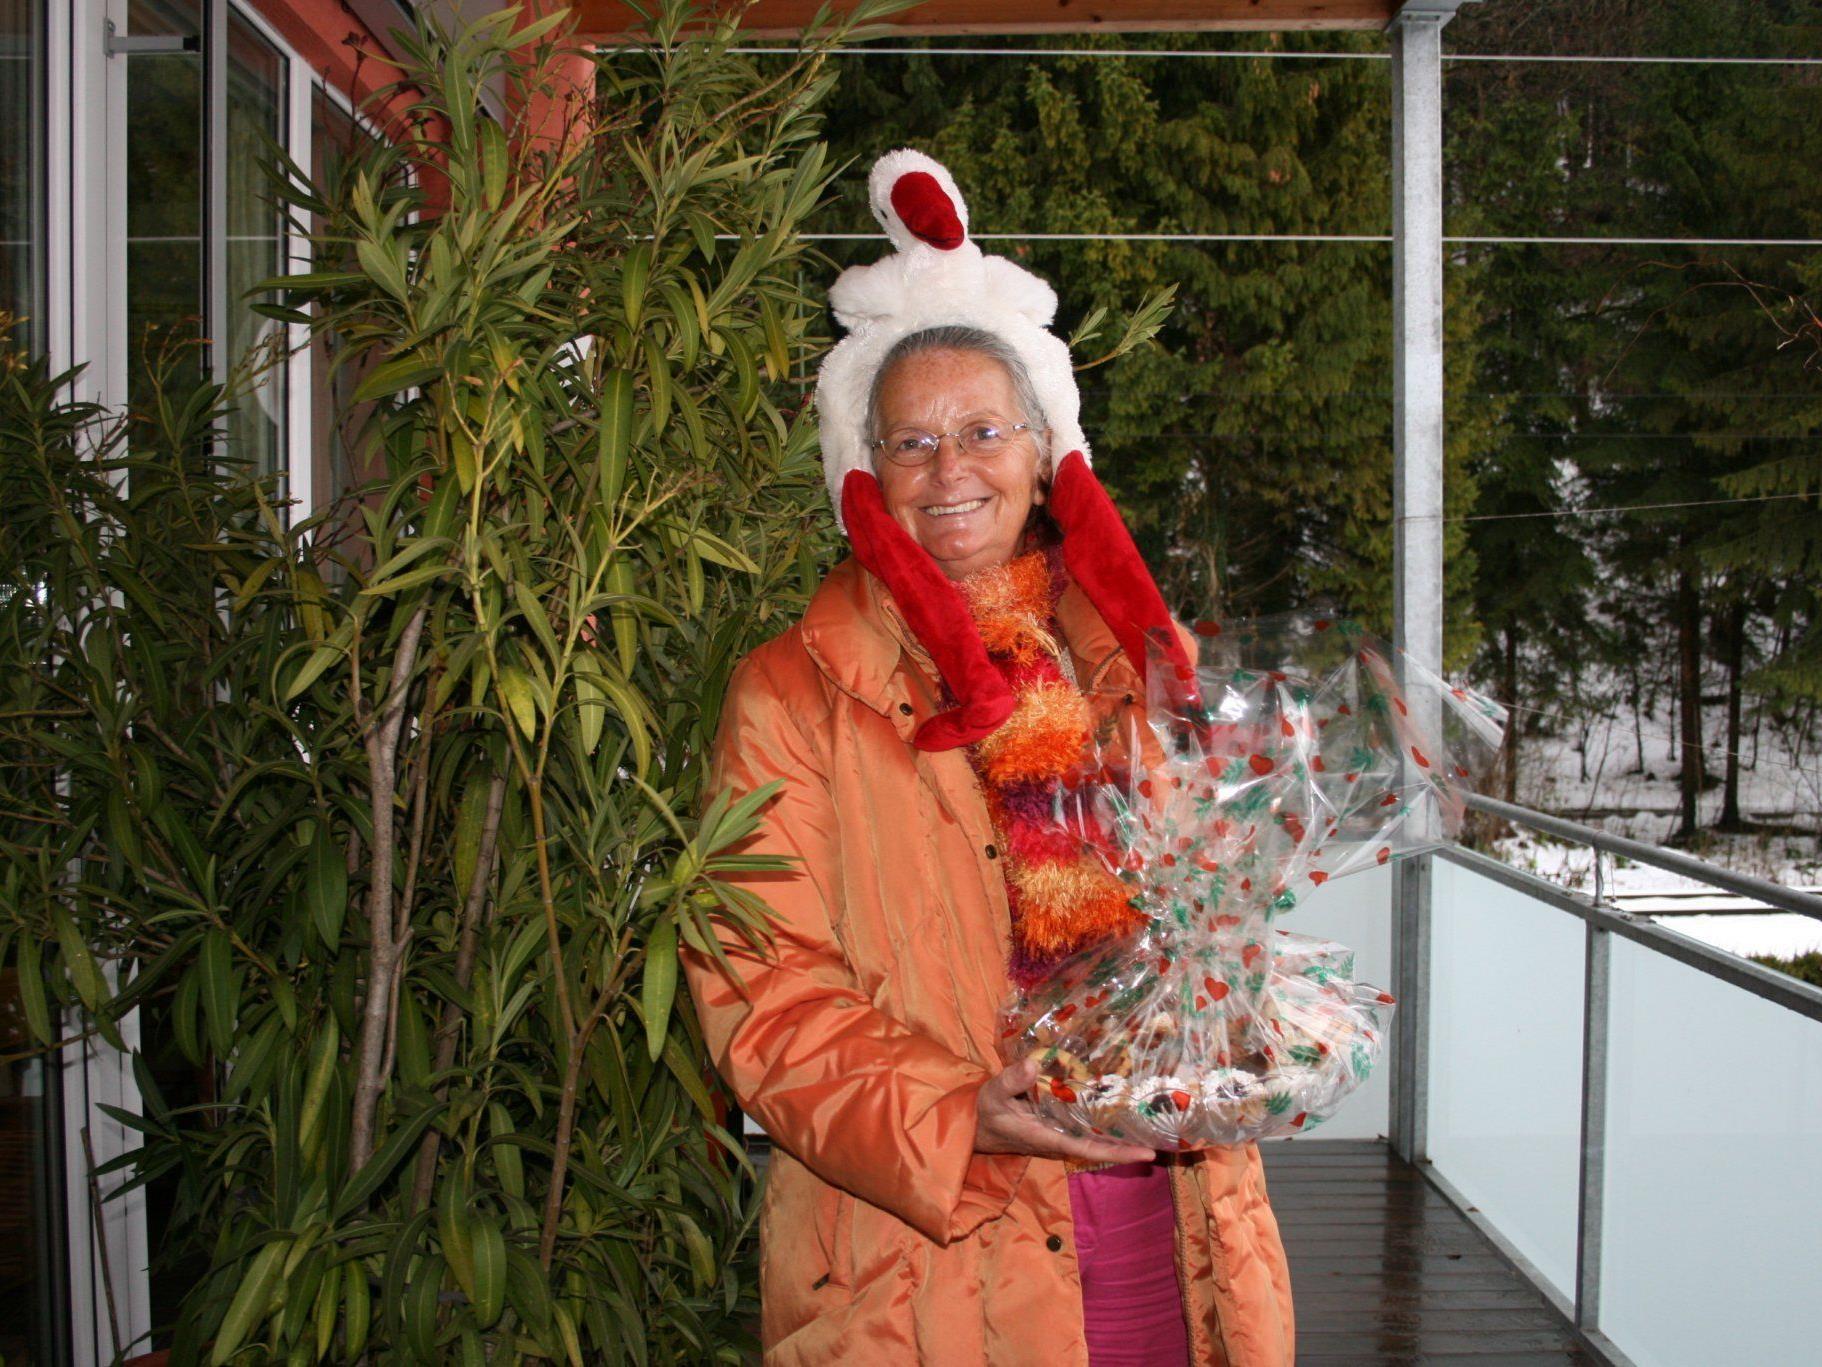 Helga Rützler vom Talente Tauschkreis Feldkirch.